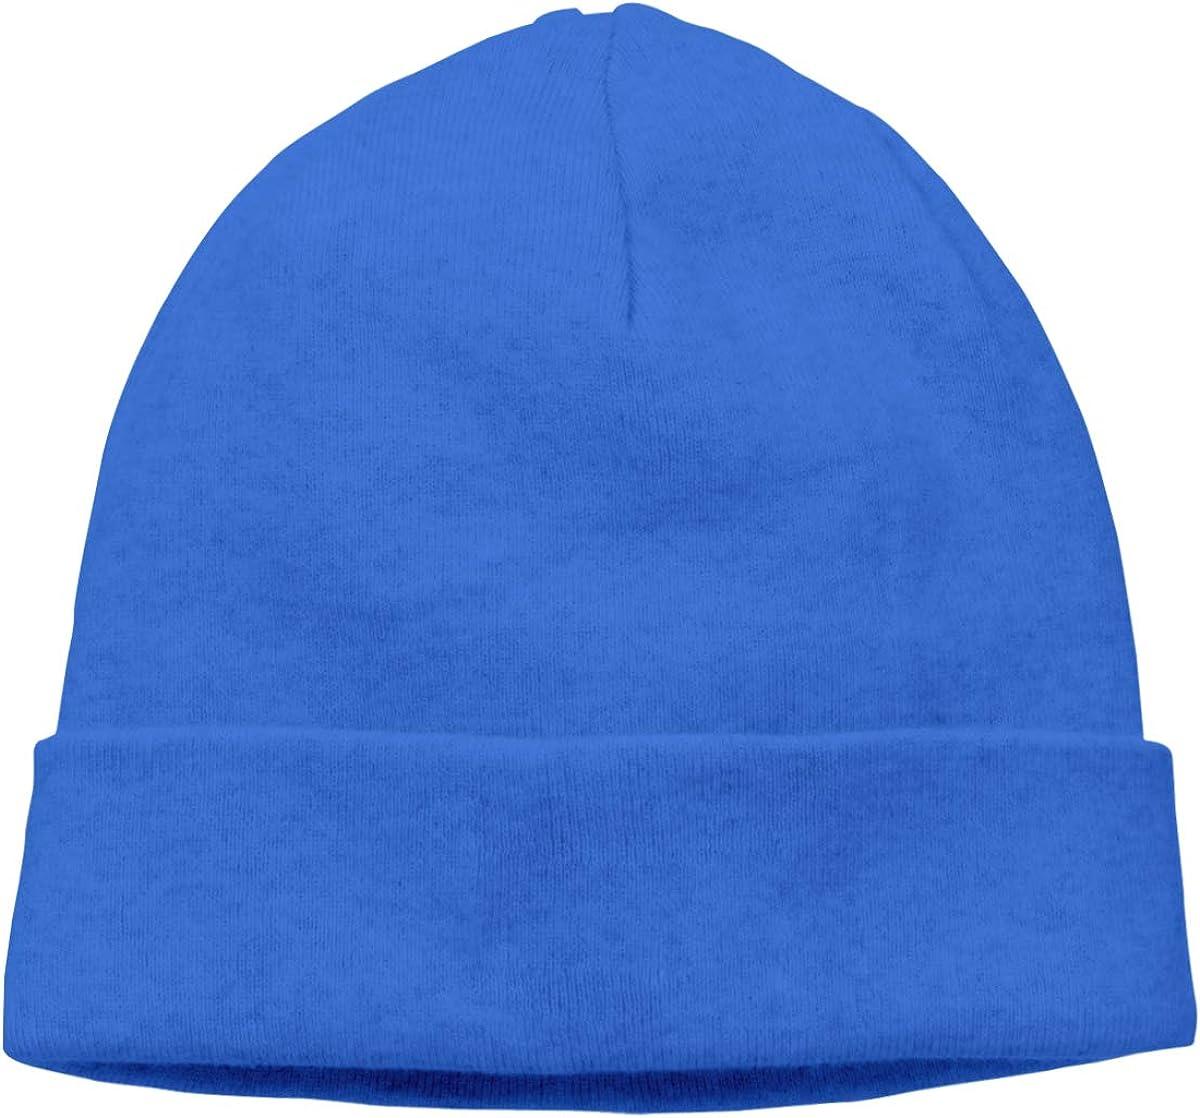 Sun Beach car Skull Cap Beanie Cap for Men Blue